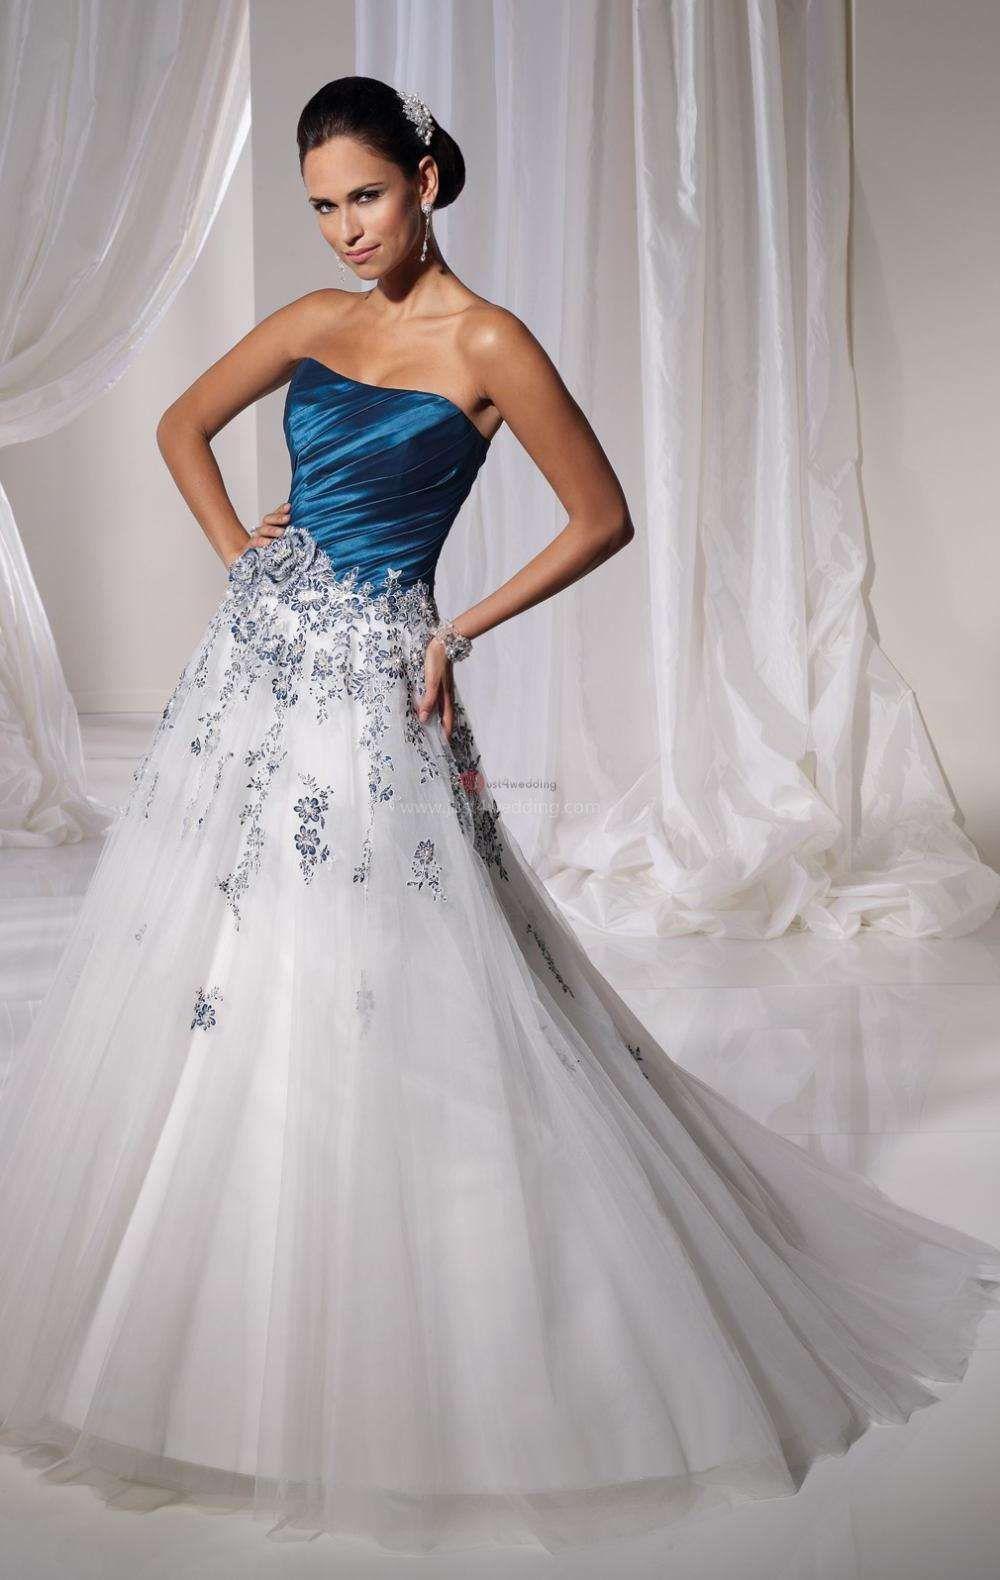 79fc5543ab Ball Gown Wedding Dresses Blue. Ball Gown Wedding Dresses Blue. Colorful Royal  Blue Ball Gowns Wedding Dresses 2018 Custom Made Y